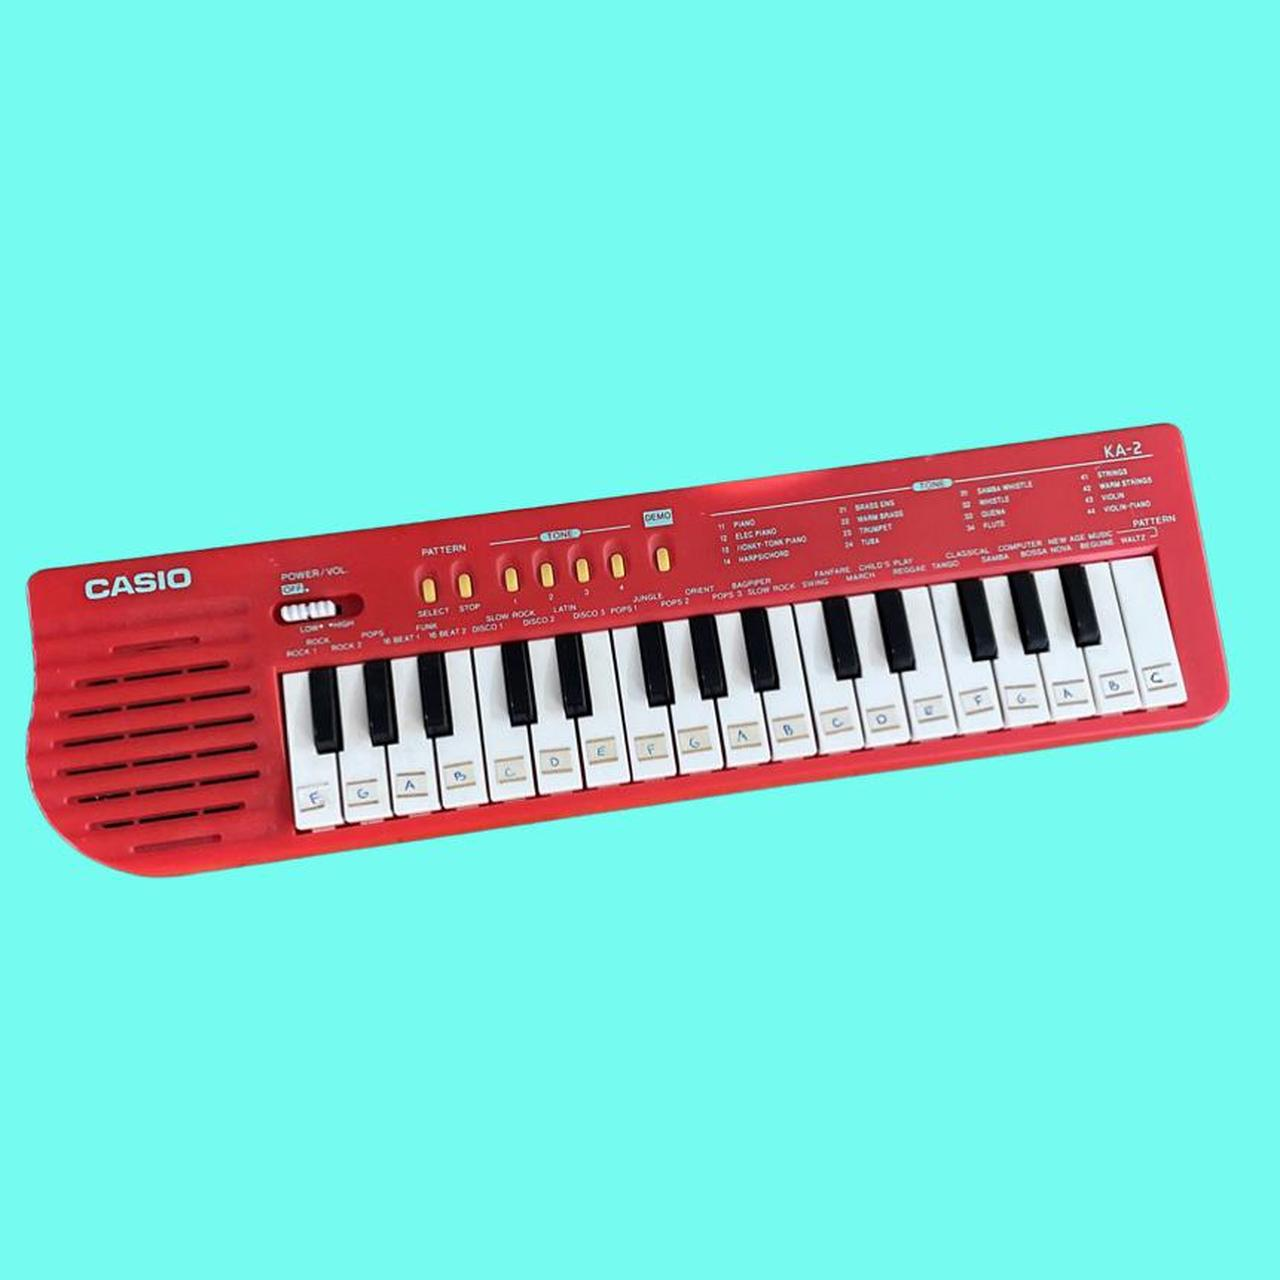 Product Image 1 - Vintage Casio ka-2 mini keyboard.